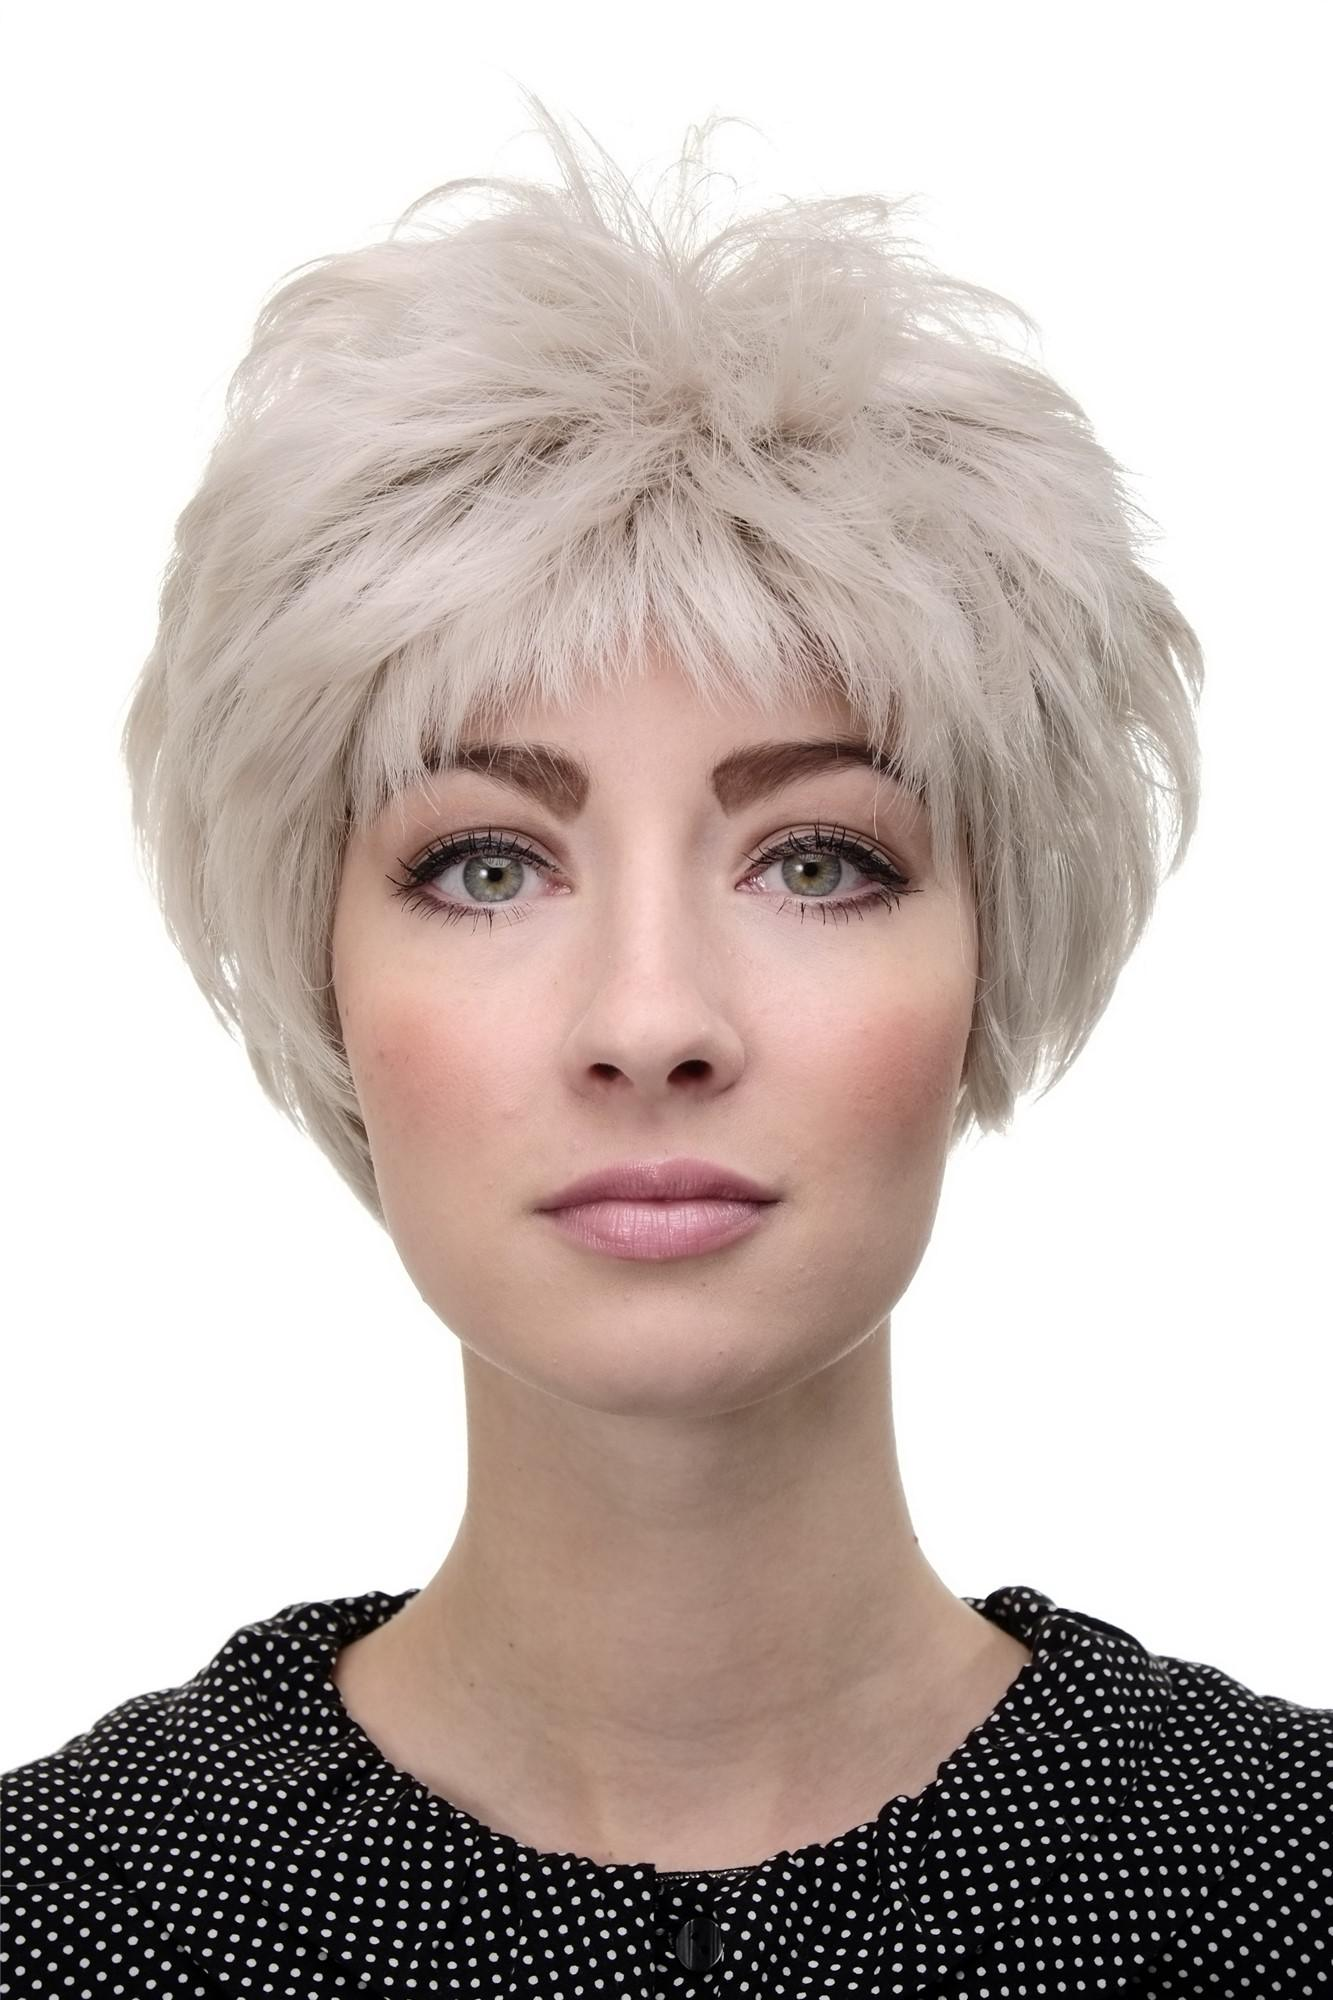 Damenperucke Perucke Grau Silbergrau Kurz Igel Frisur Reife Dame Wig